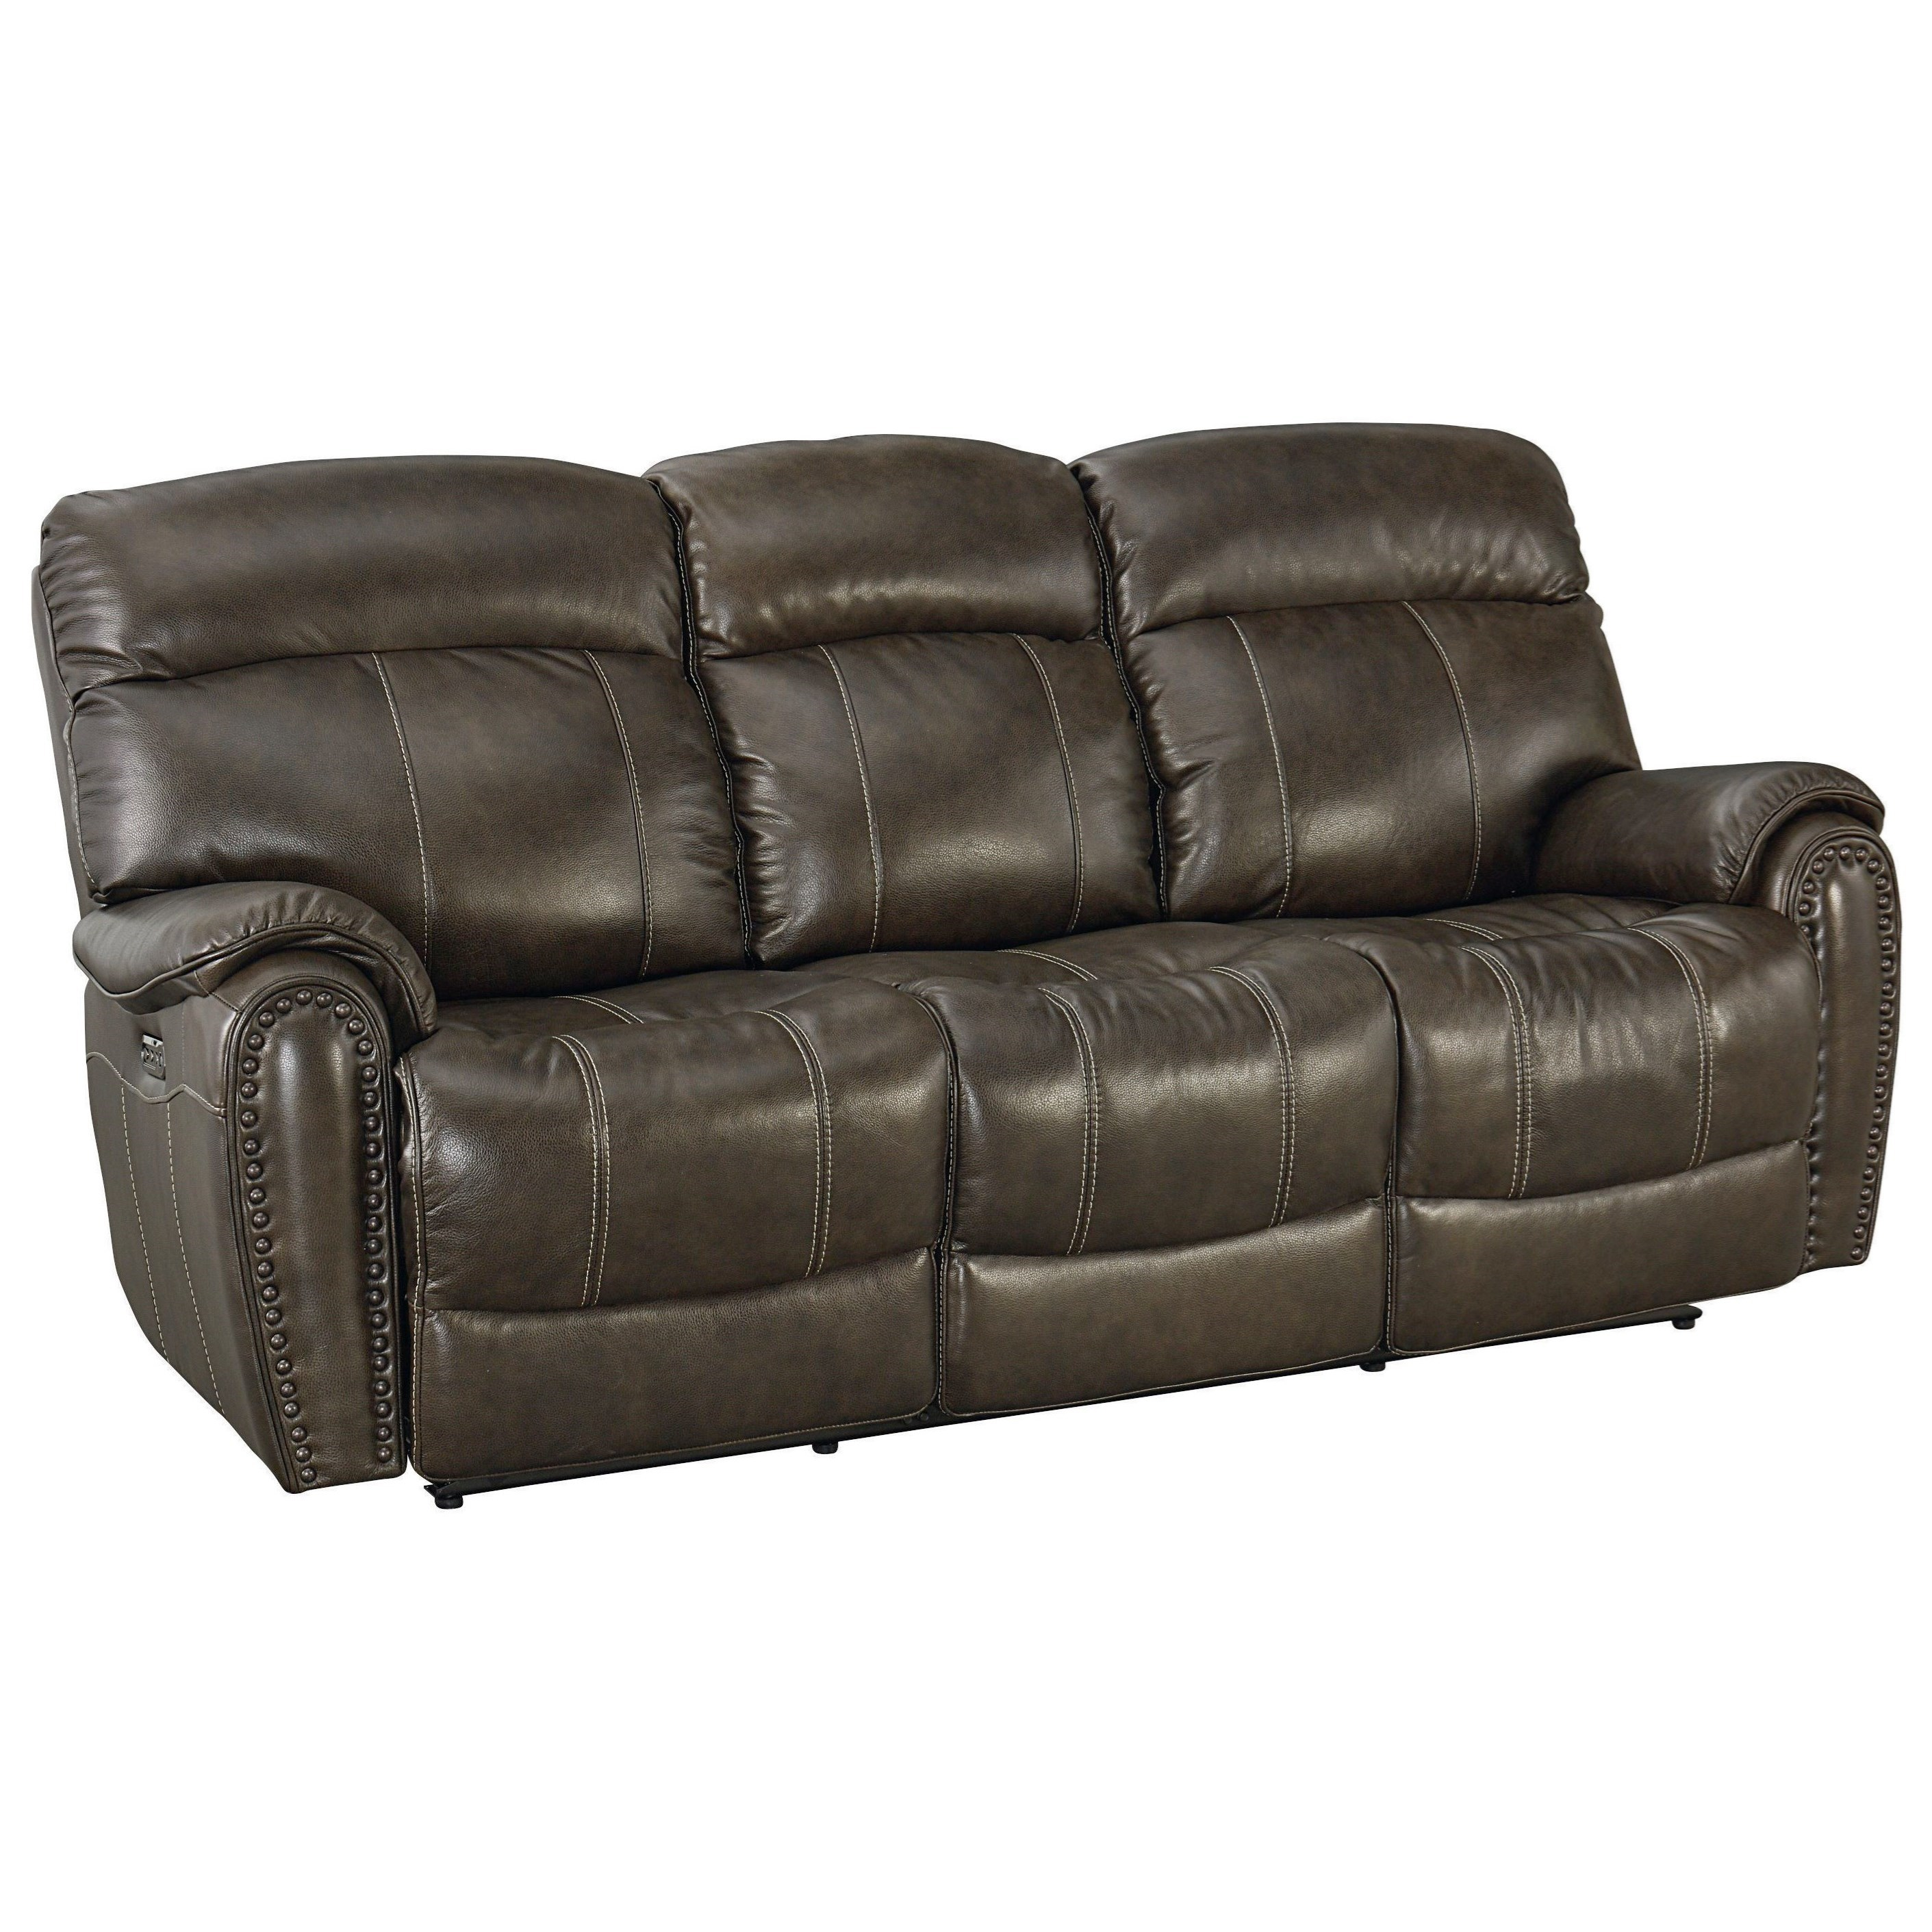 Bassett Bridgeport - Club Level 3723-P62 Leather Match Power ...